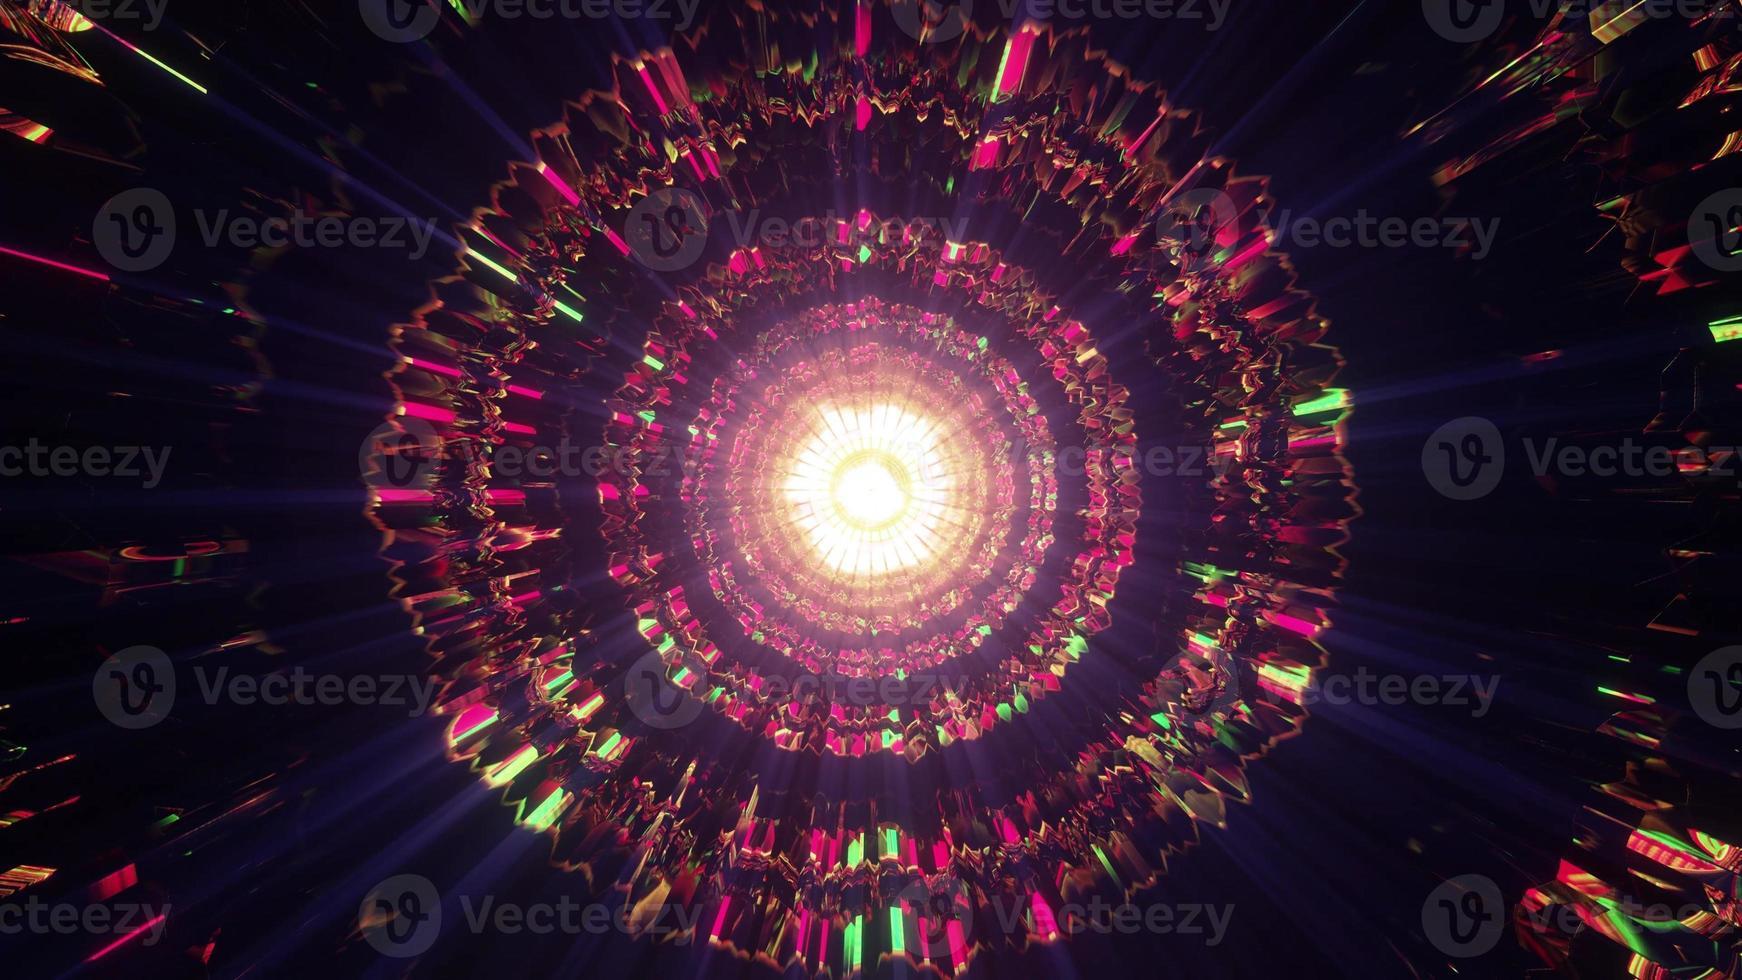 Colorful crystal tunnel 4K UHD 3D illustration photo